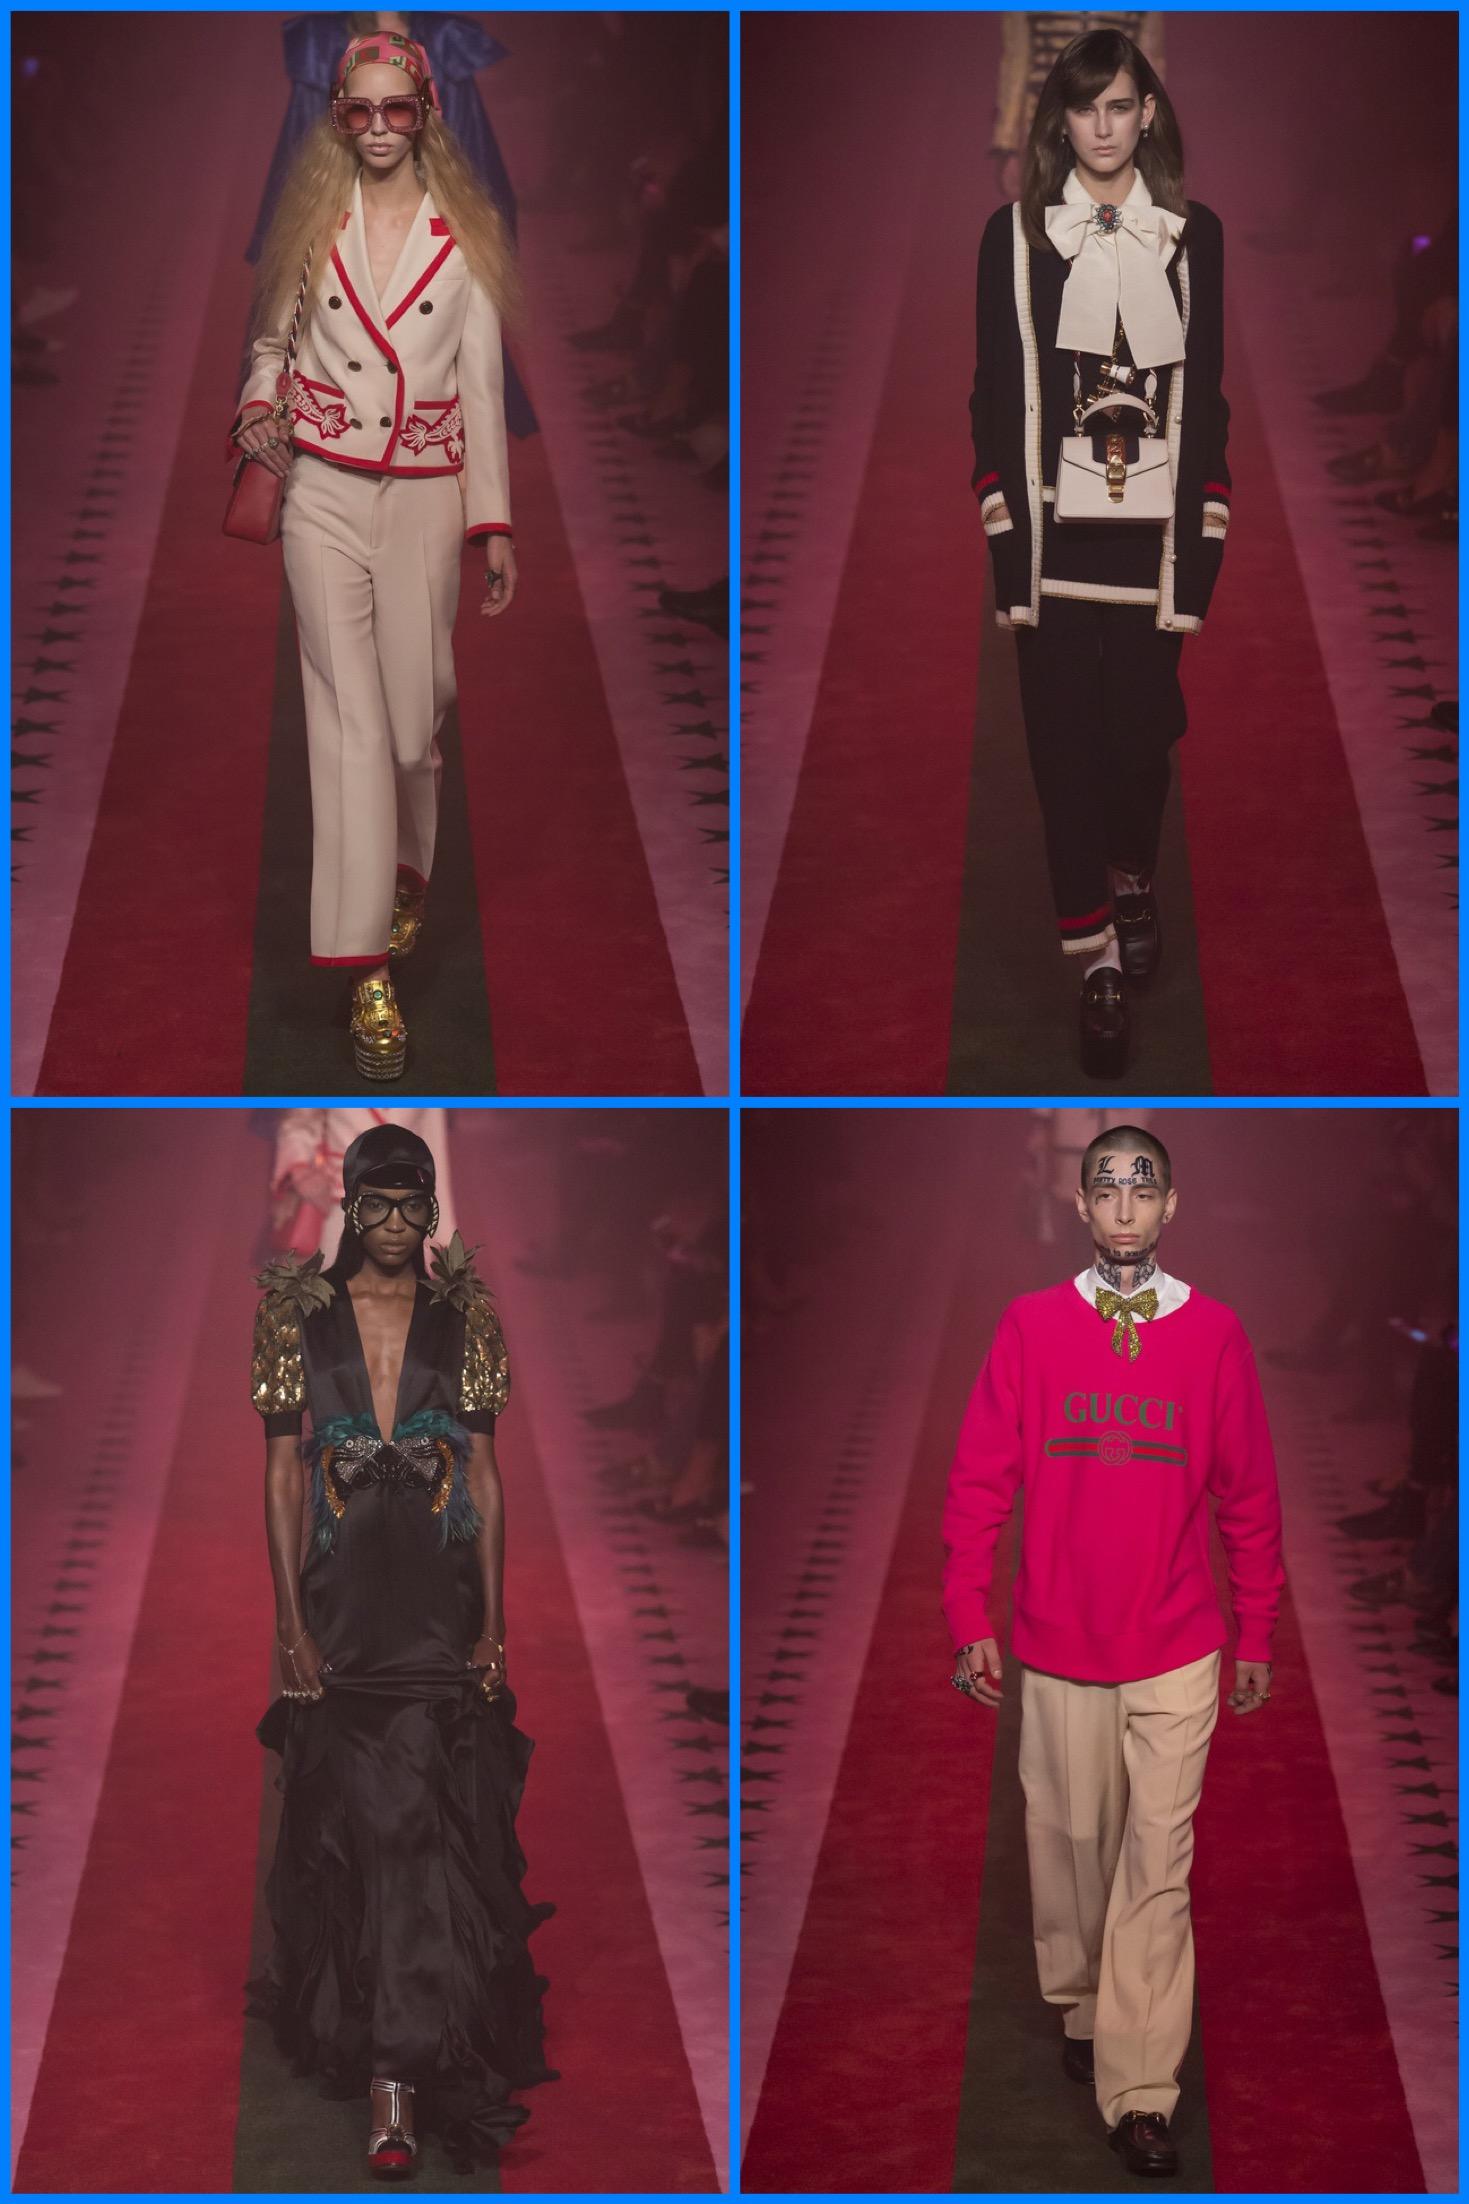 milano-fashion-week-pret-a-porter-spring-summer-2017-style-gucci